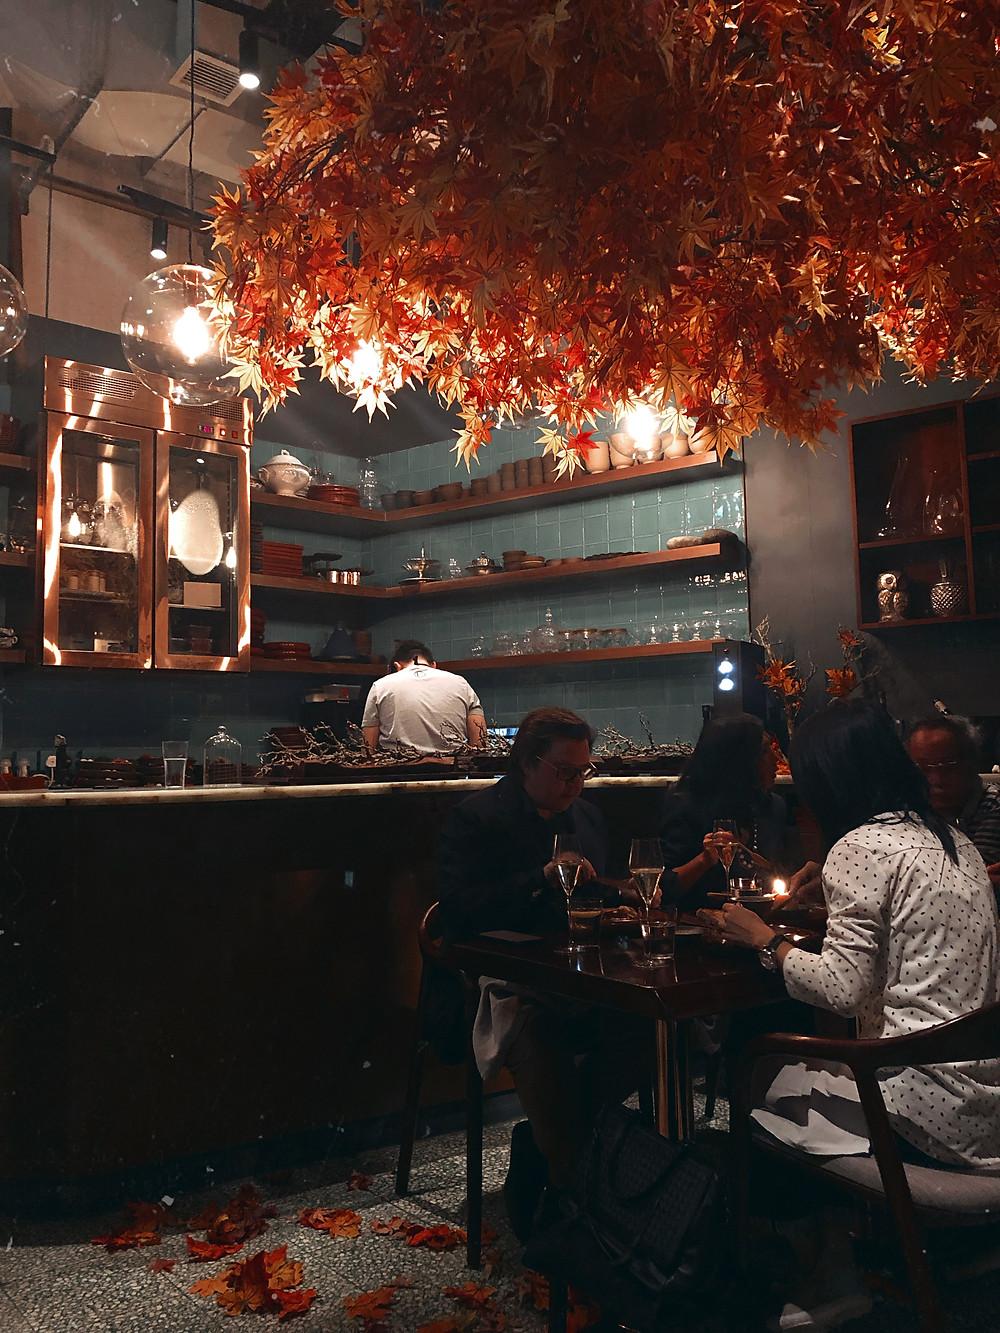 Restaurant Uwe | Uwe Opocensky